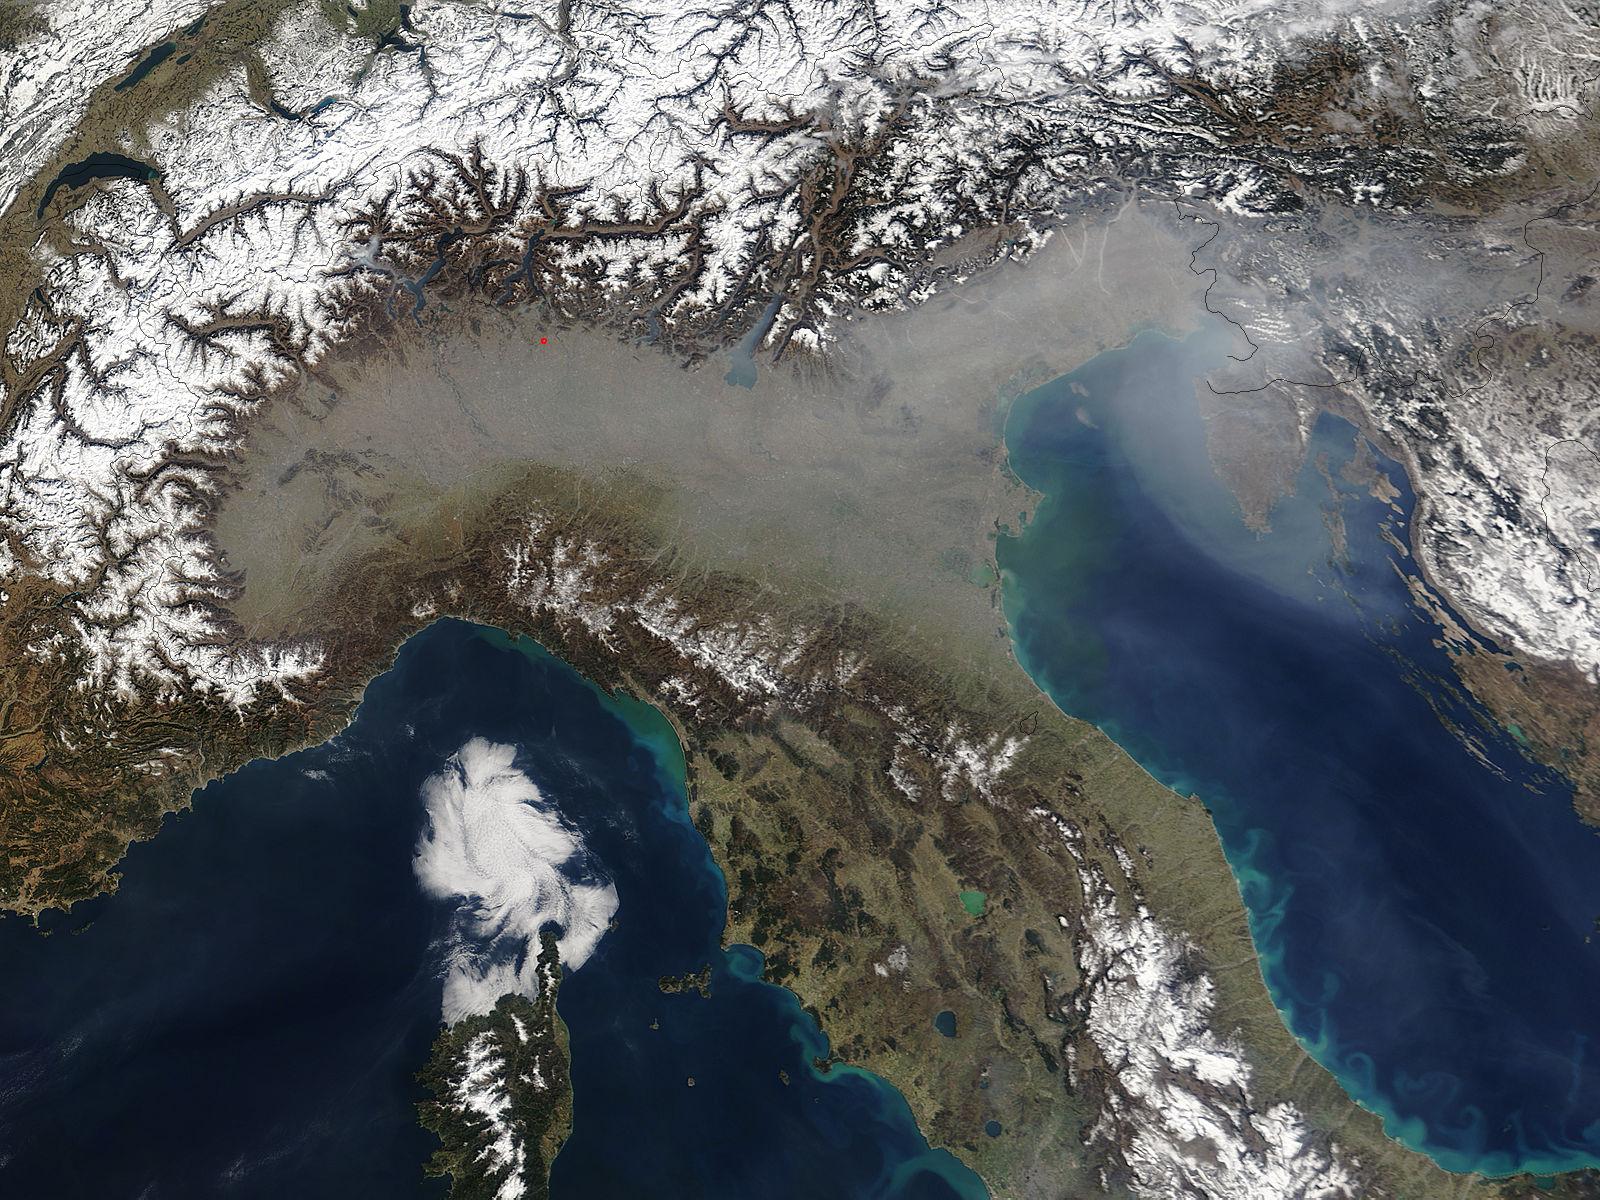 Cartina Satellitare Lombardia.Immagini Satellitari La Pianura Padana E Tra Le Zone Piu Inquinate D Europa L Osservatore D Italia